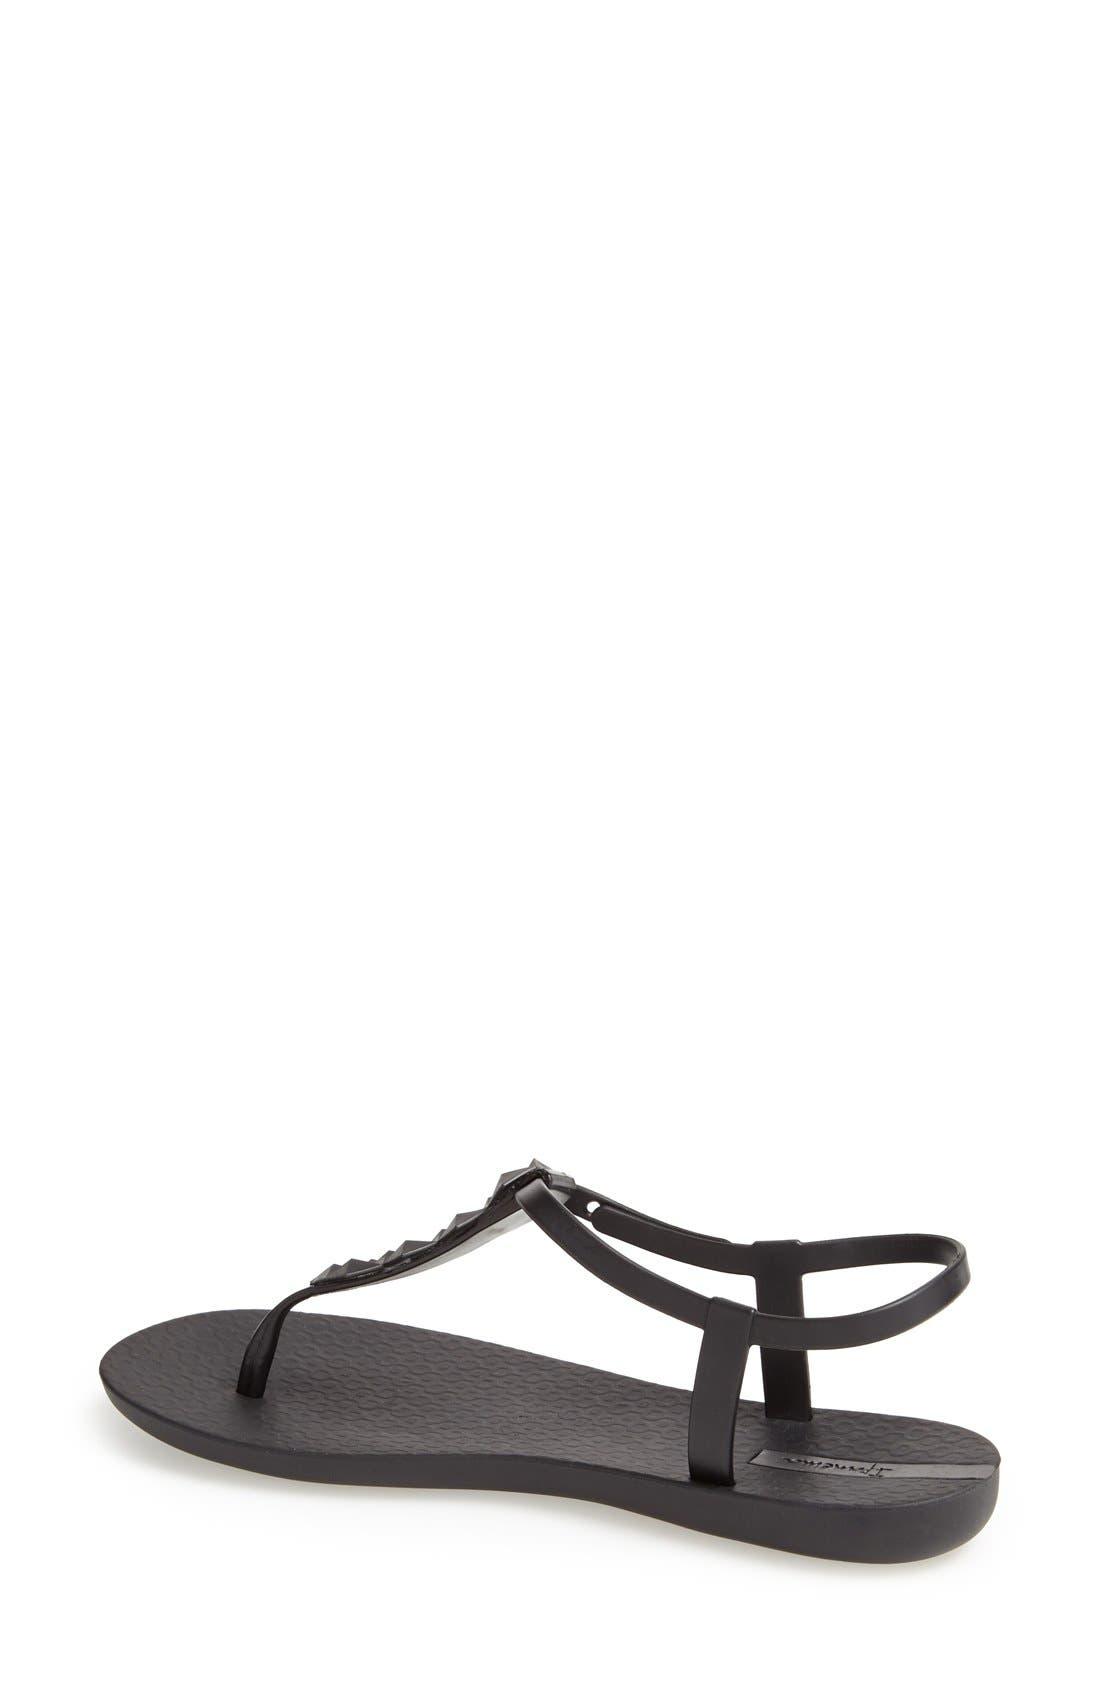 'Cleo' Pyramid Stud Ankle Strap Flip Flop,                             Alternate thumbnail 2, color,                             Black